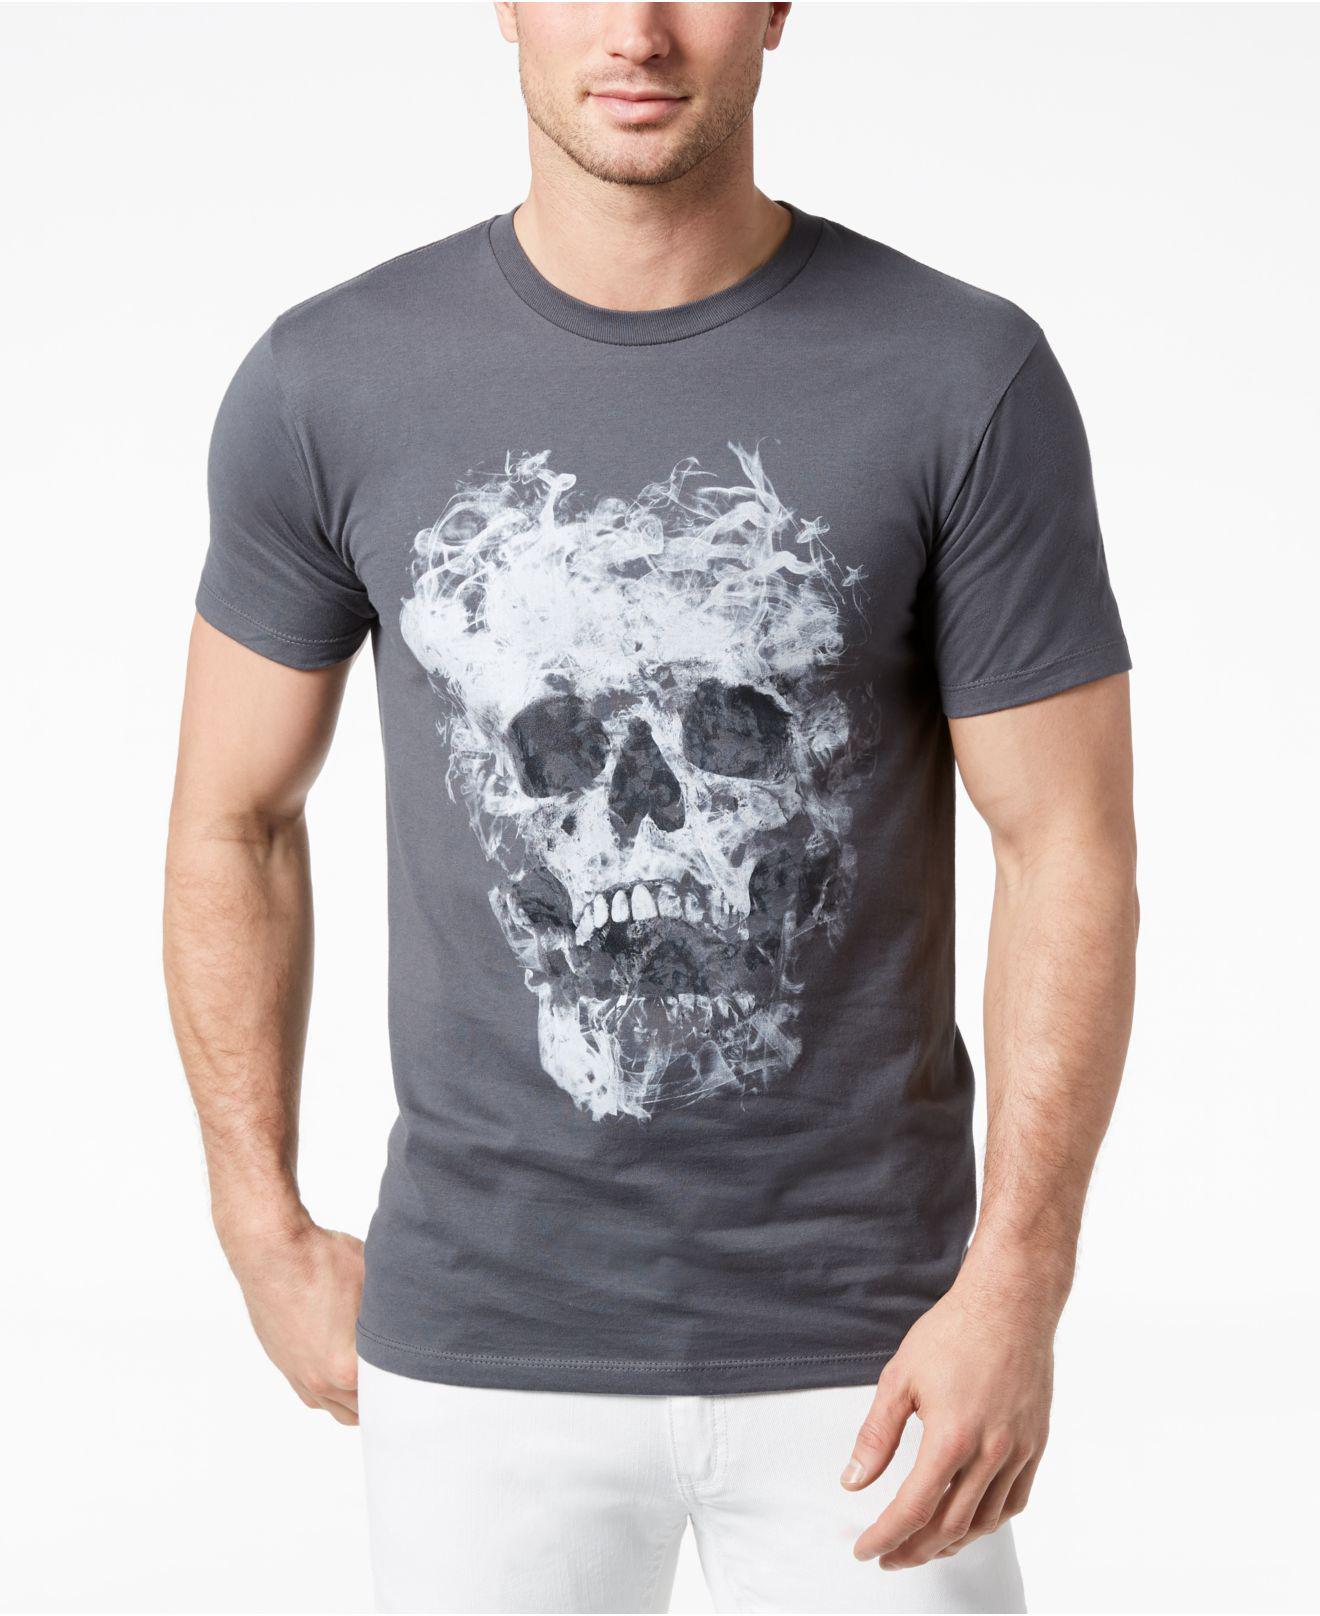 575ba441a203 Macys Inc Mens T Shirts – Rockwall Auction